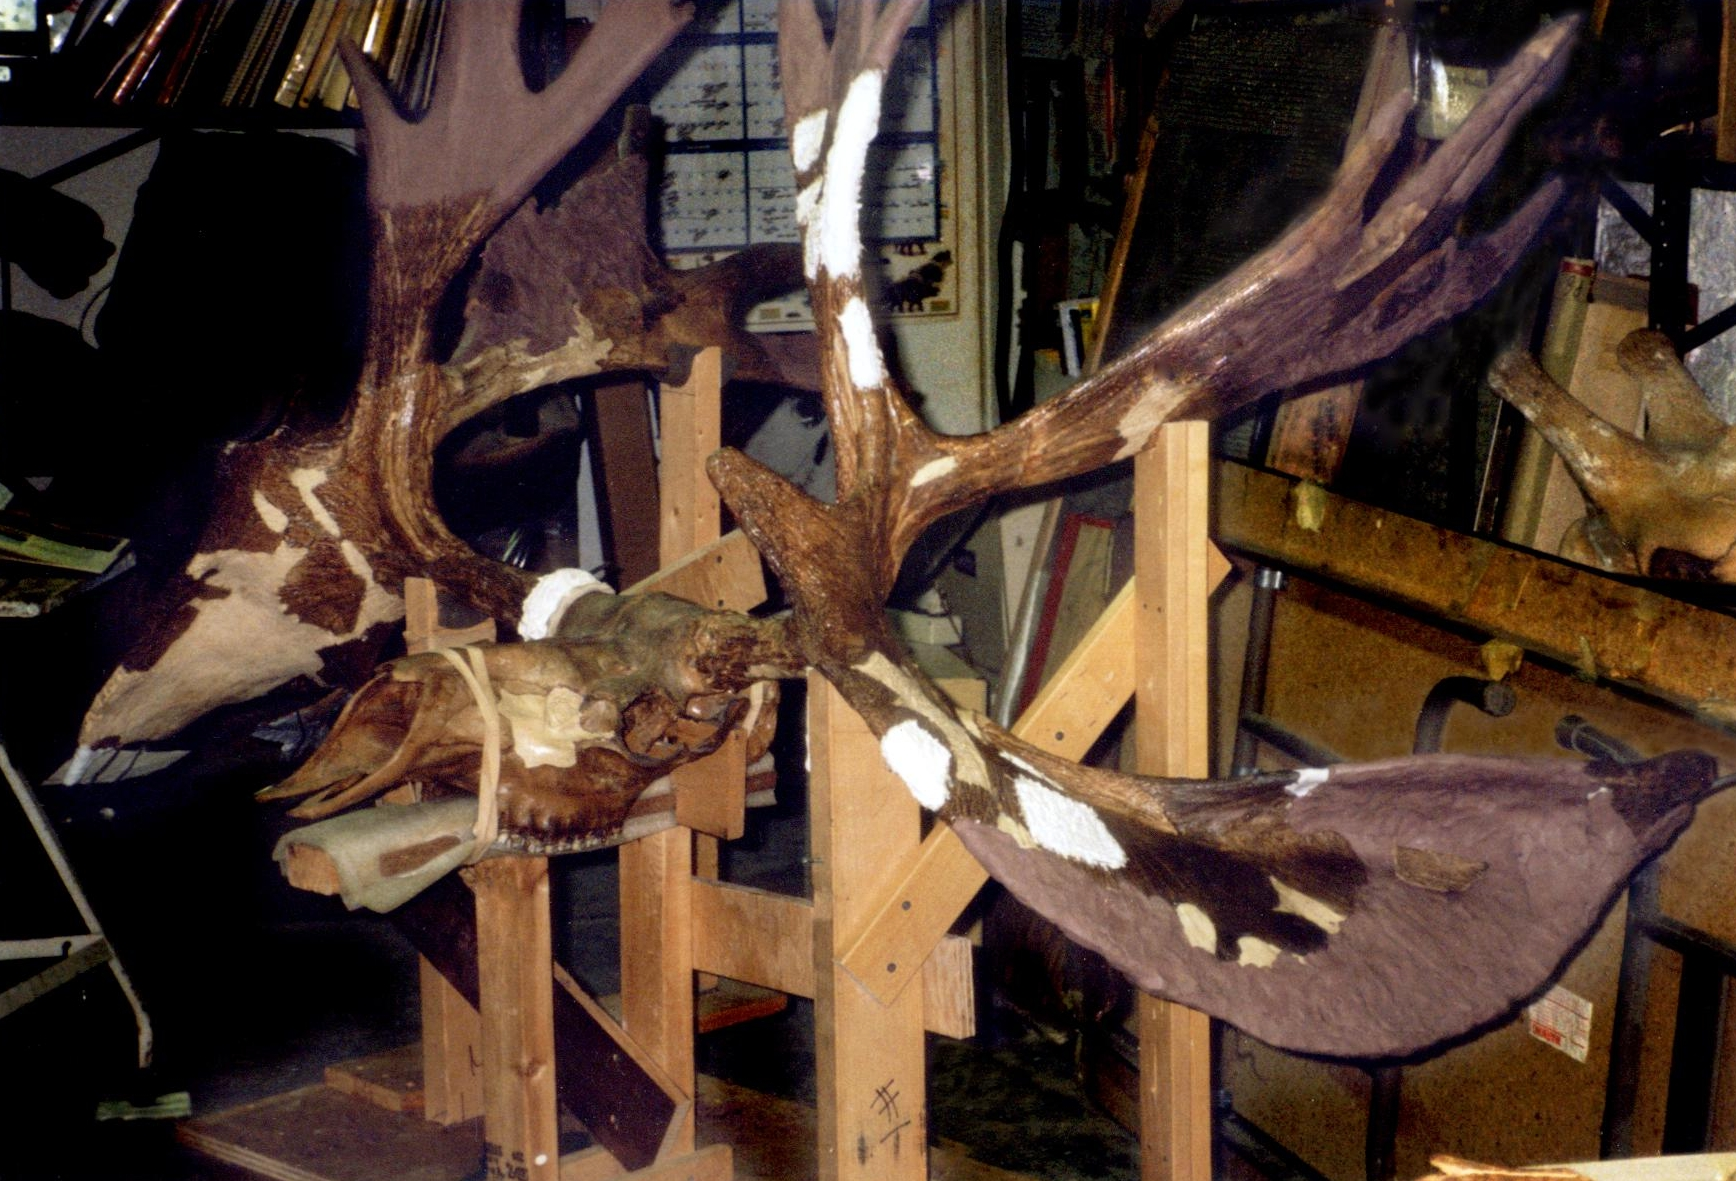 Maxilla and Mandible, Prehistoric antlers